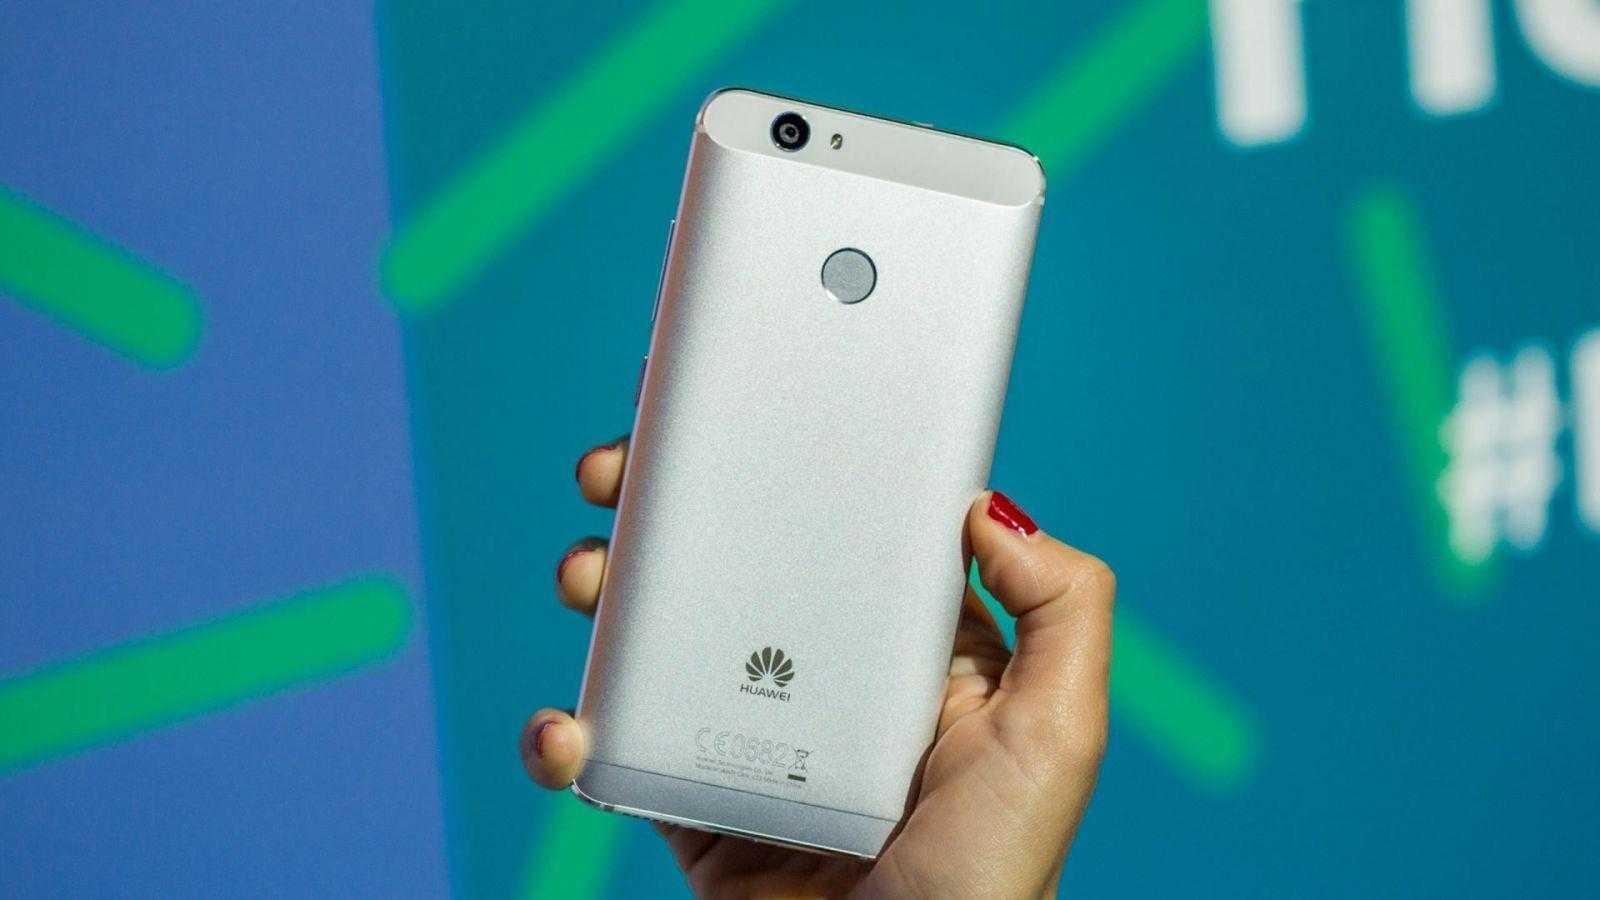 Huawei продал рекордные 200 млн телефонов в 2018 году (AndroidPIT huawei nova 5)